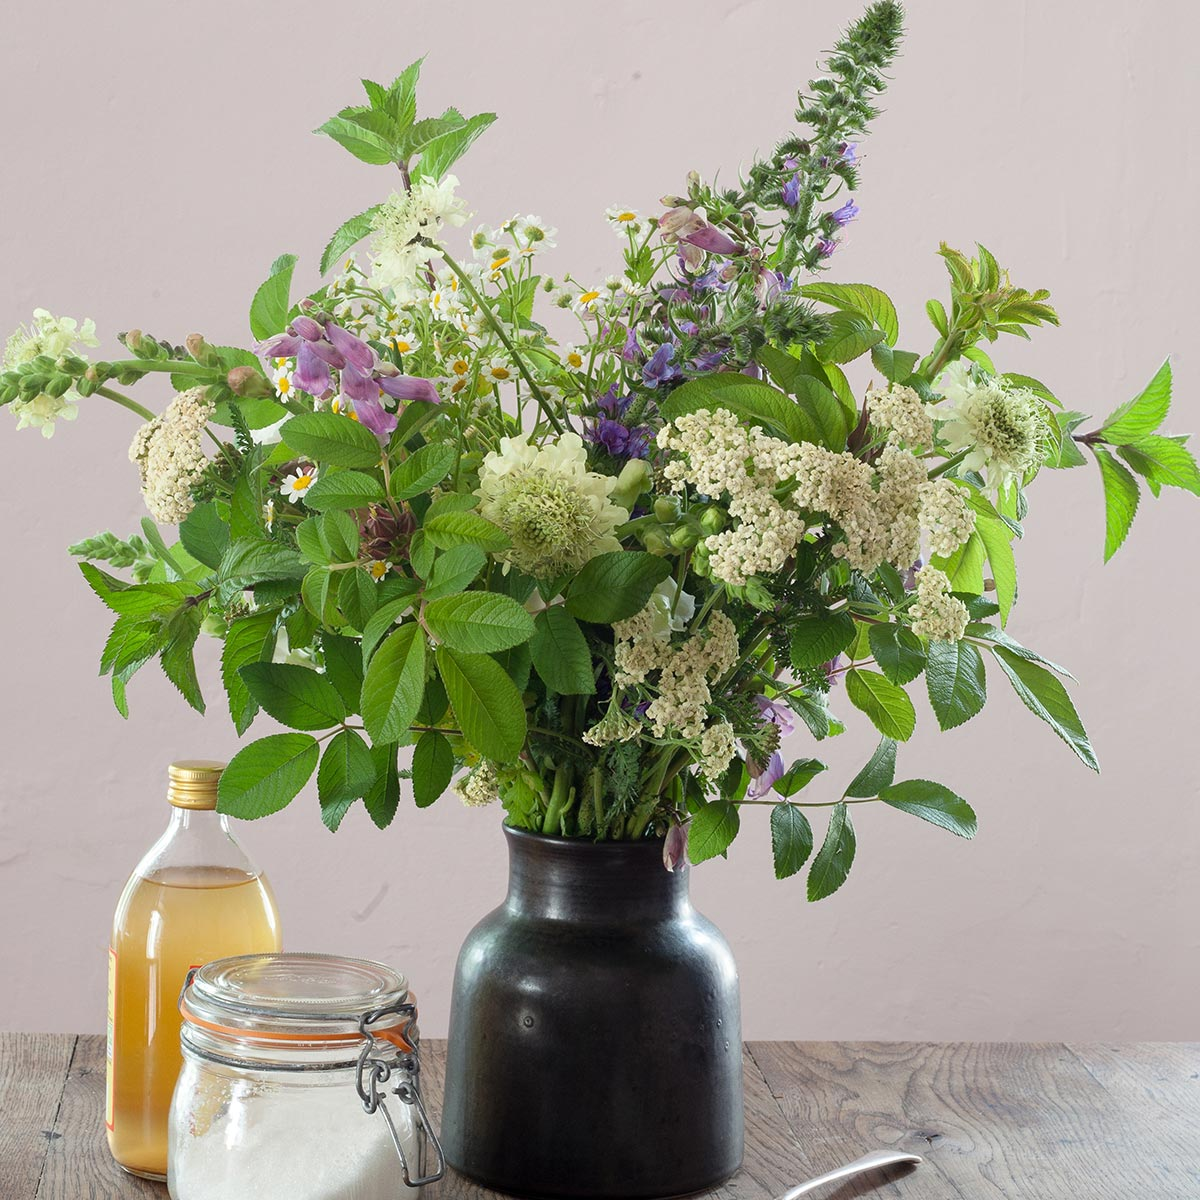 How to Make DIY Cut-Flower Food